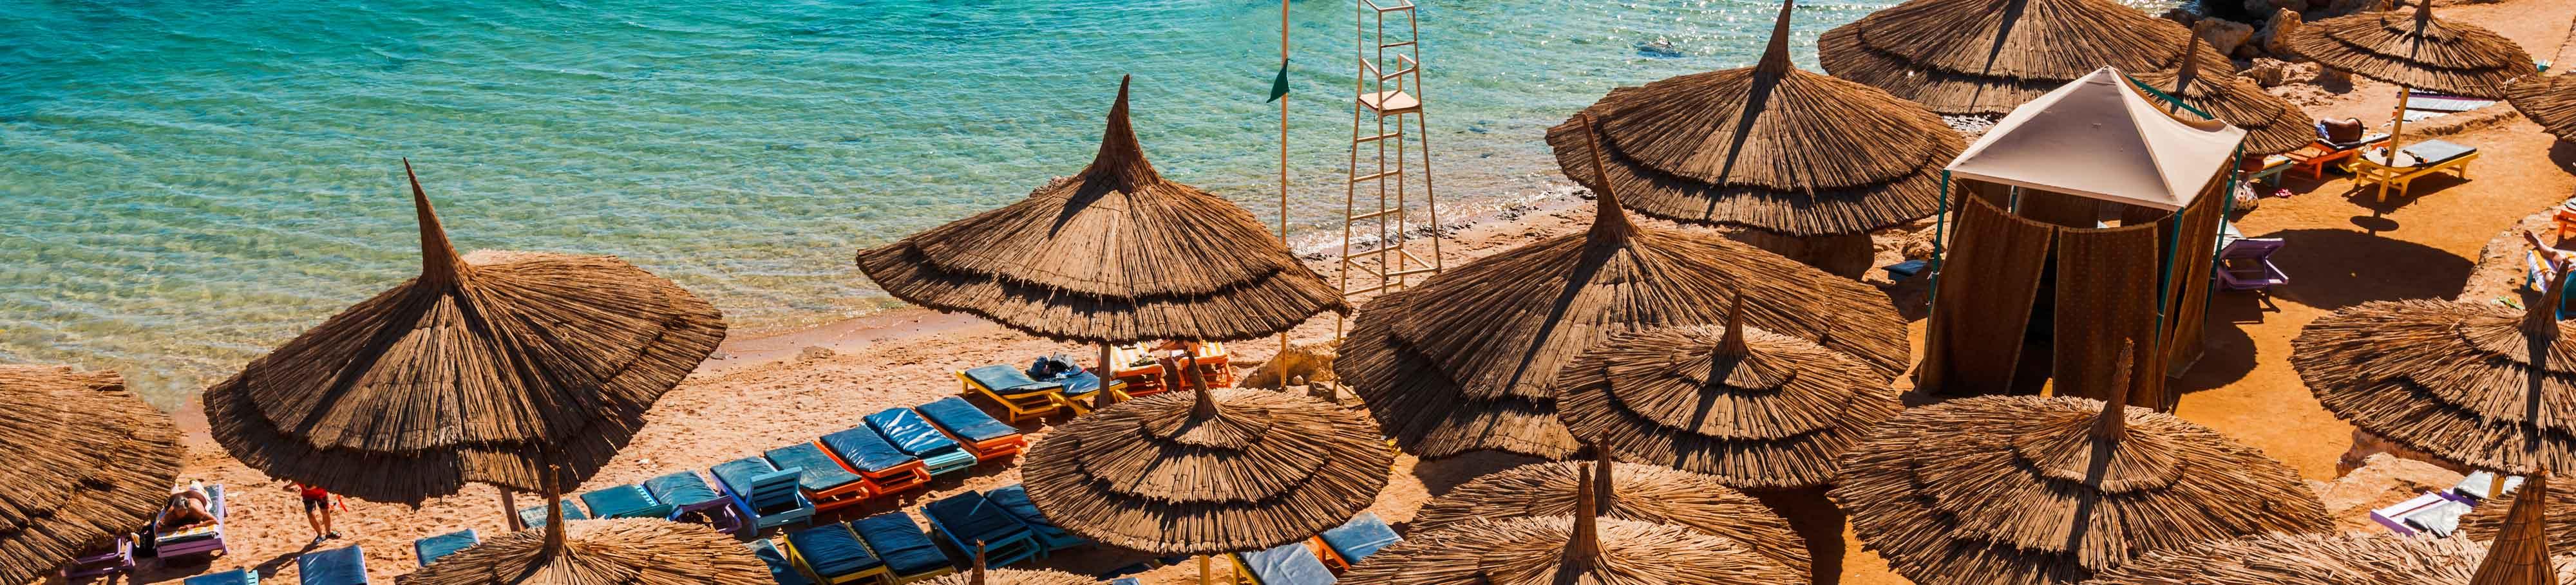 Vacances en Egypte